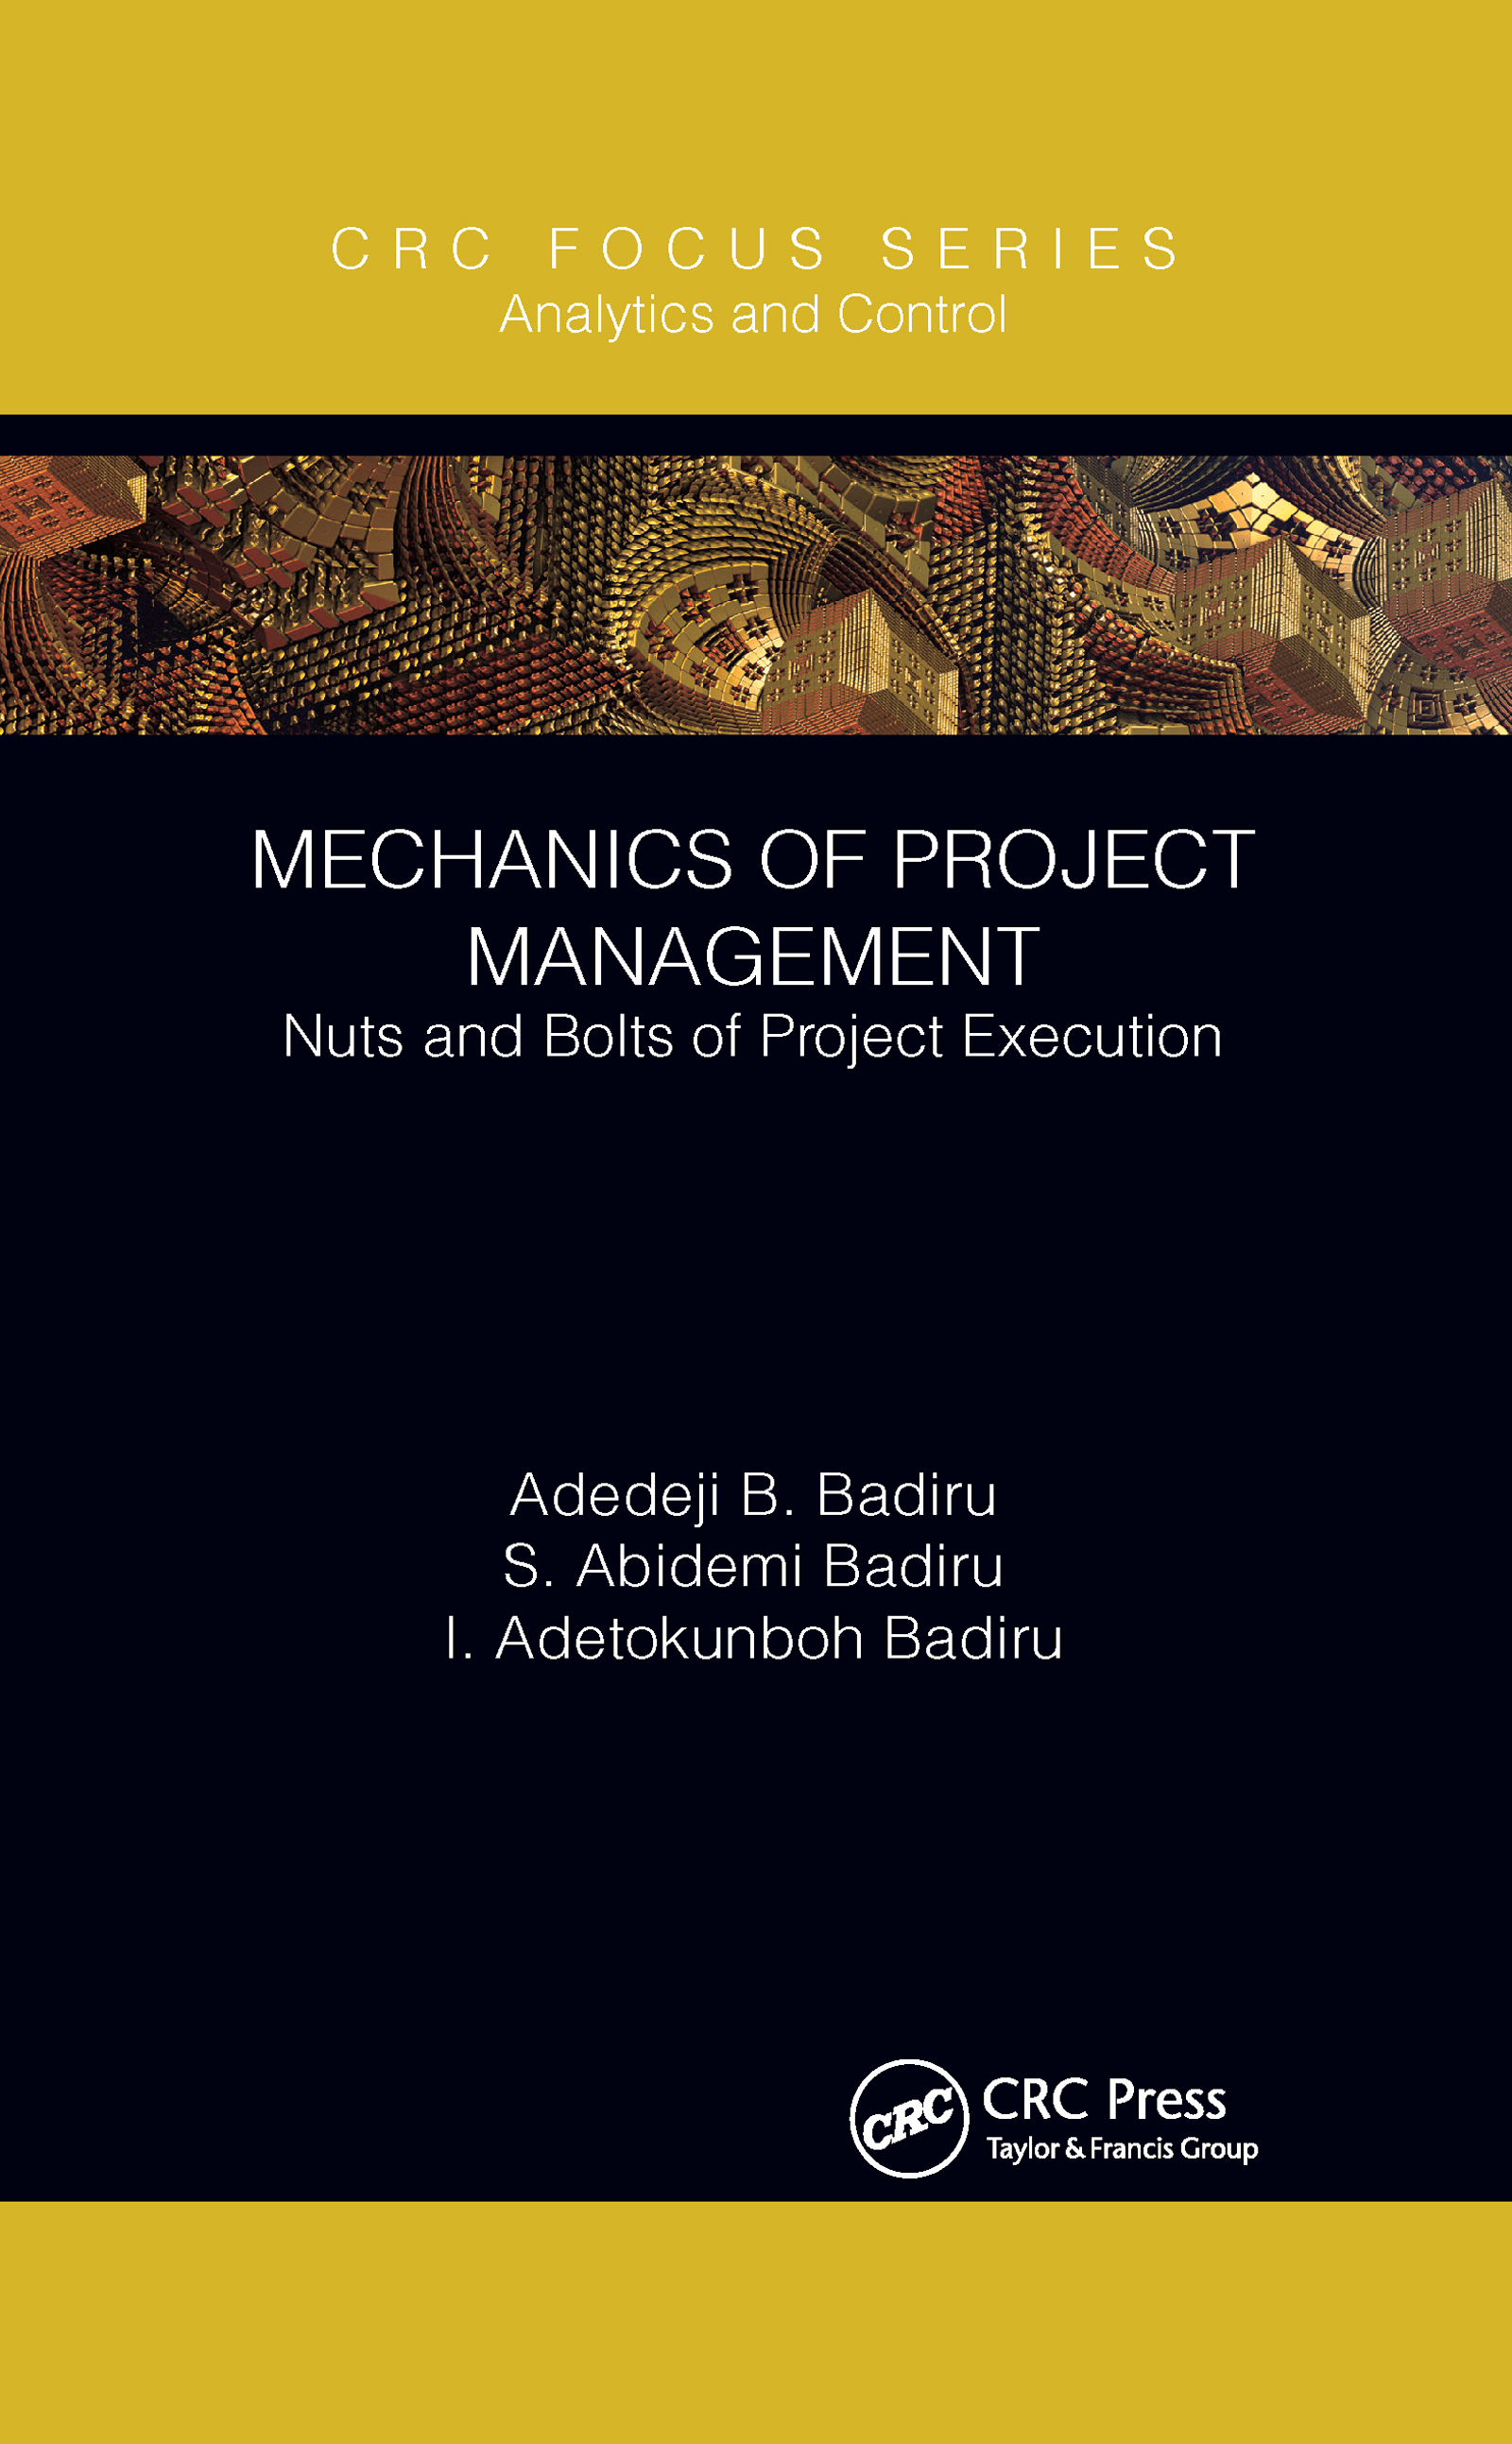 Mechanics of Project Management